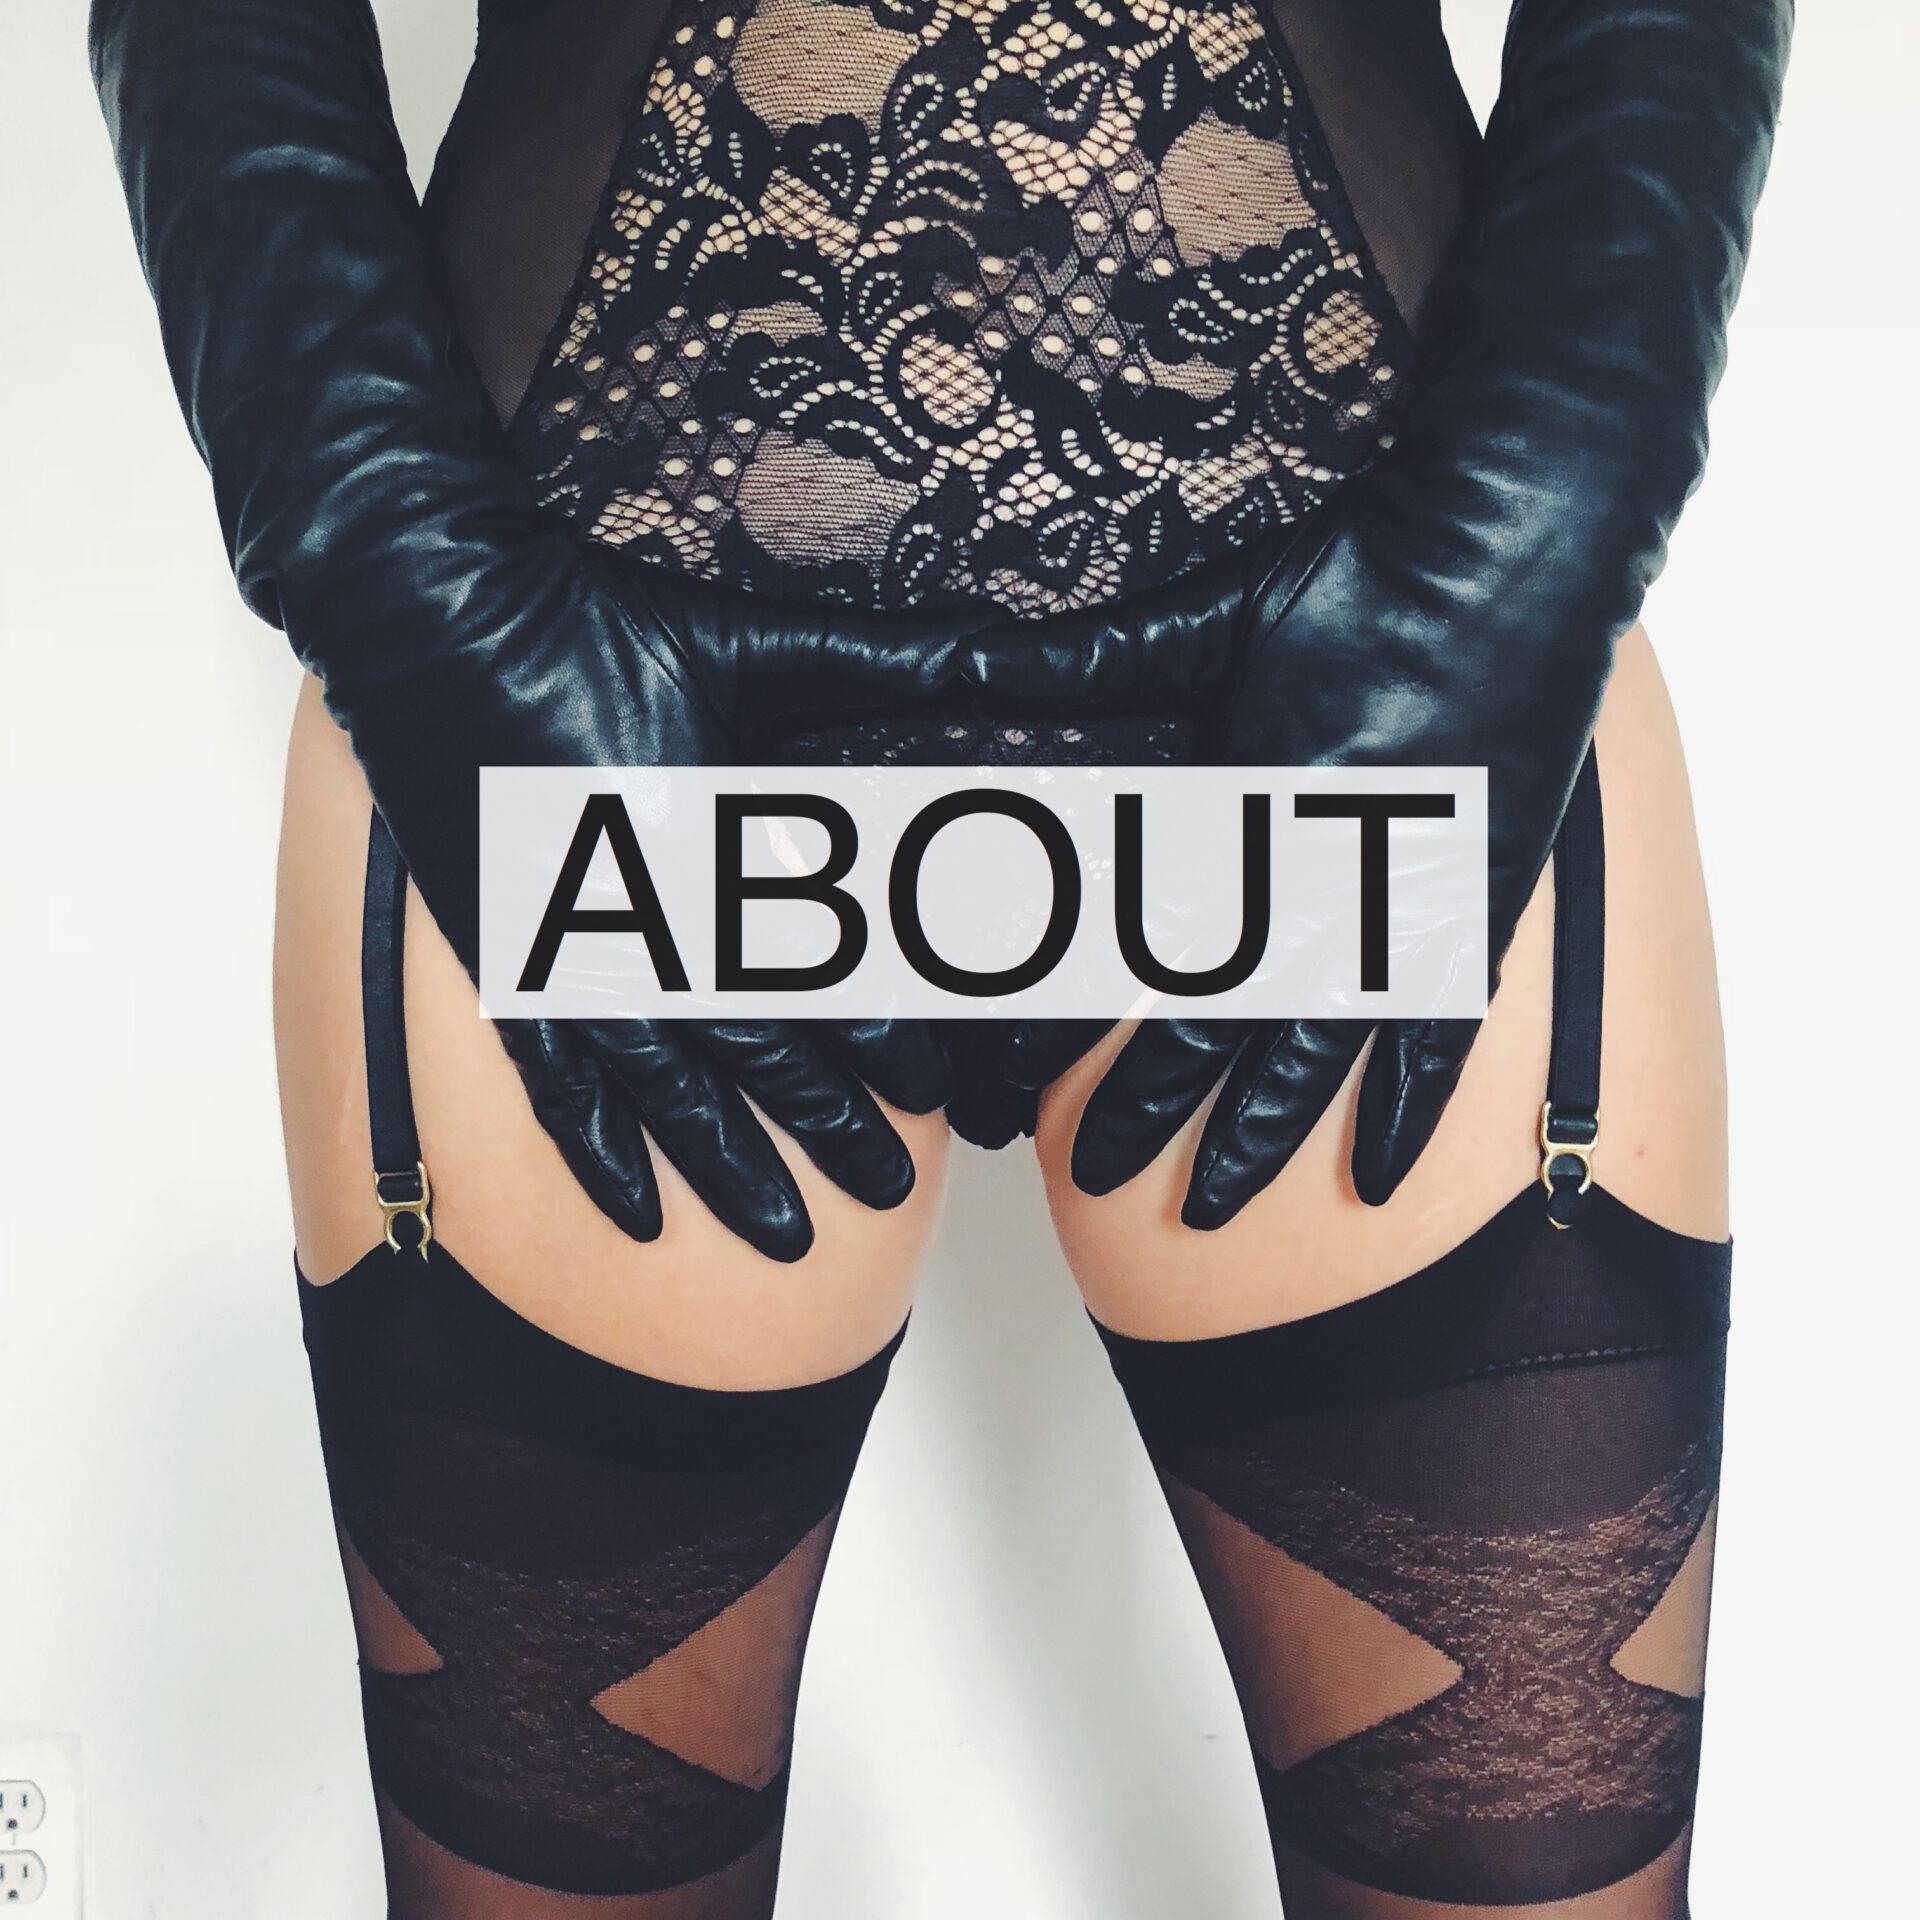 About NYC dominatrix Mistress Blunt